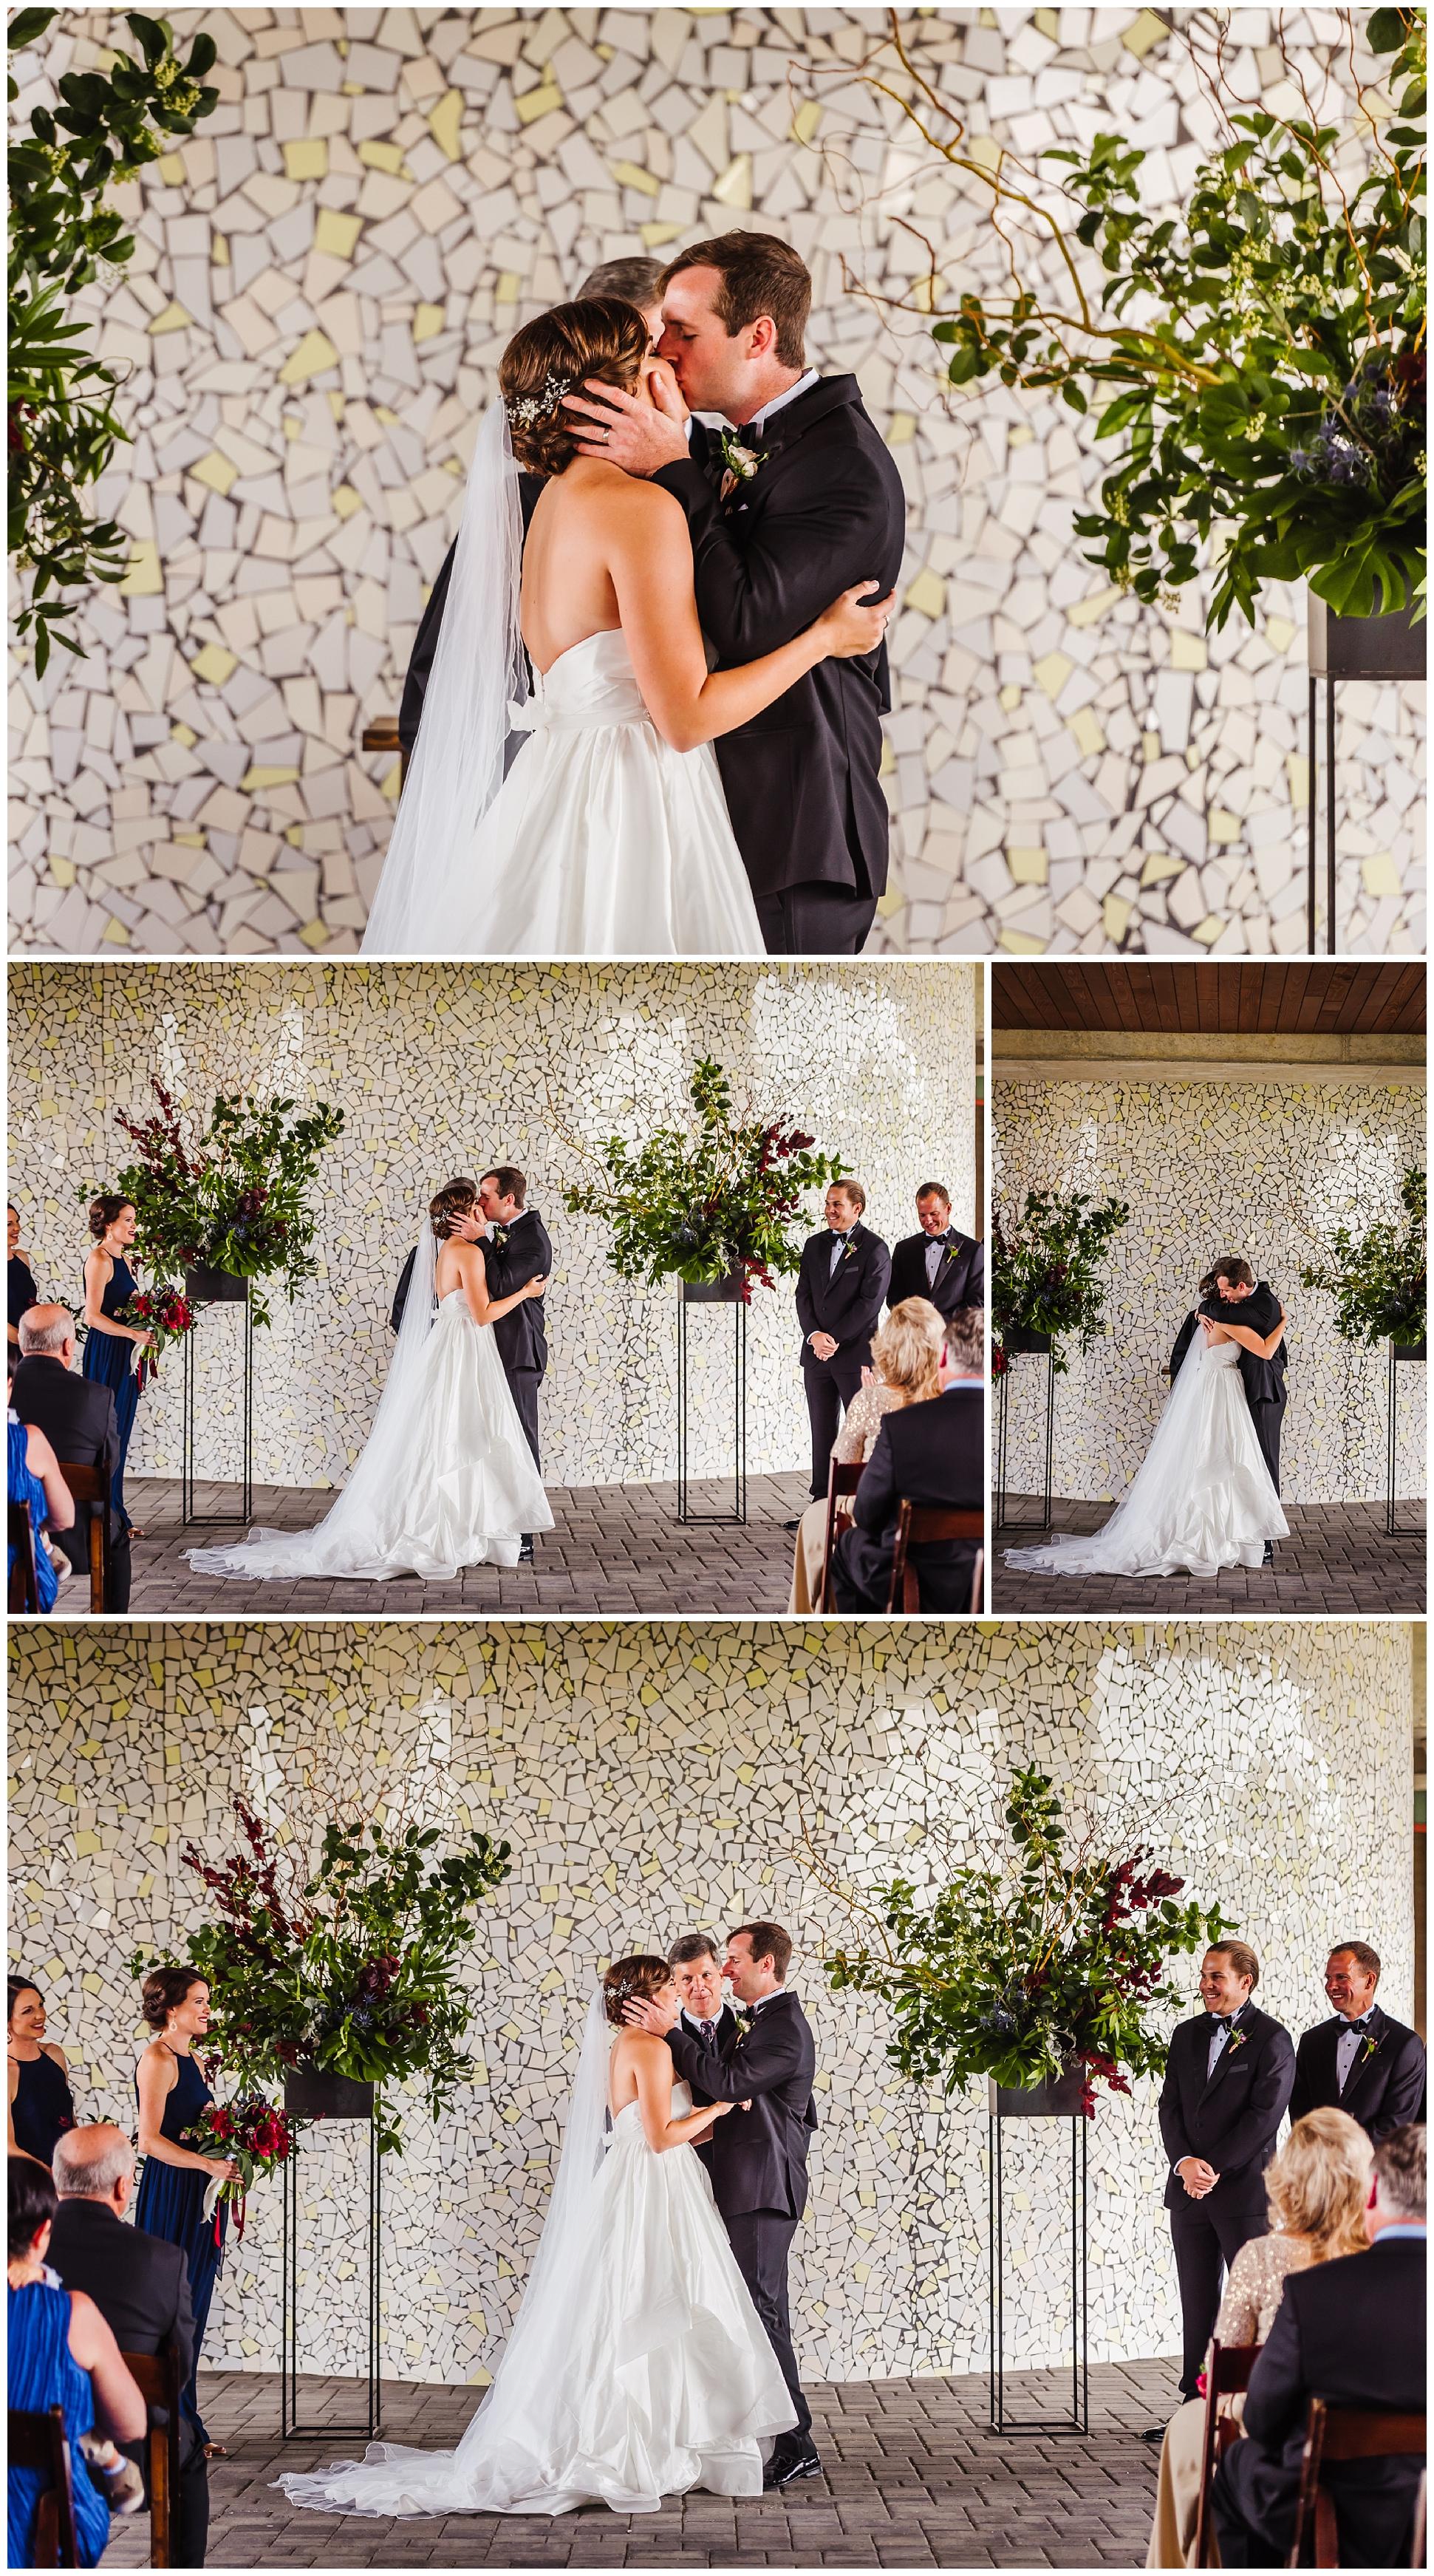 Tampa-streamsong-wedding-photographer-golf-resort-navy-blue-peonie_0077.jpg